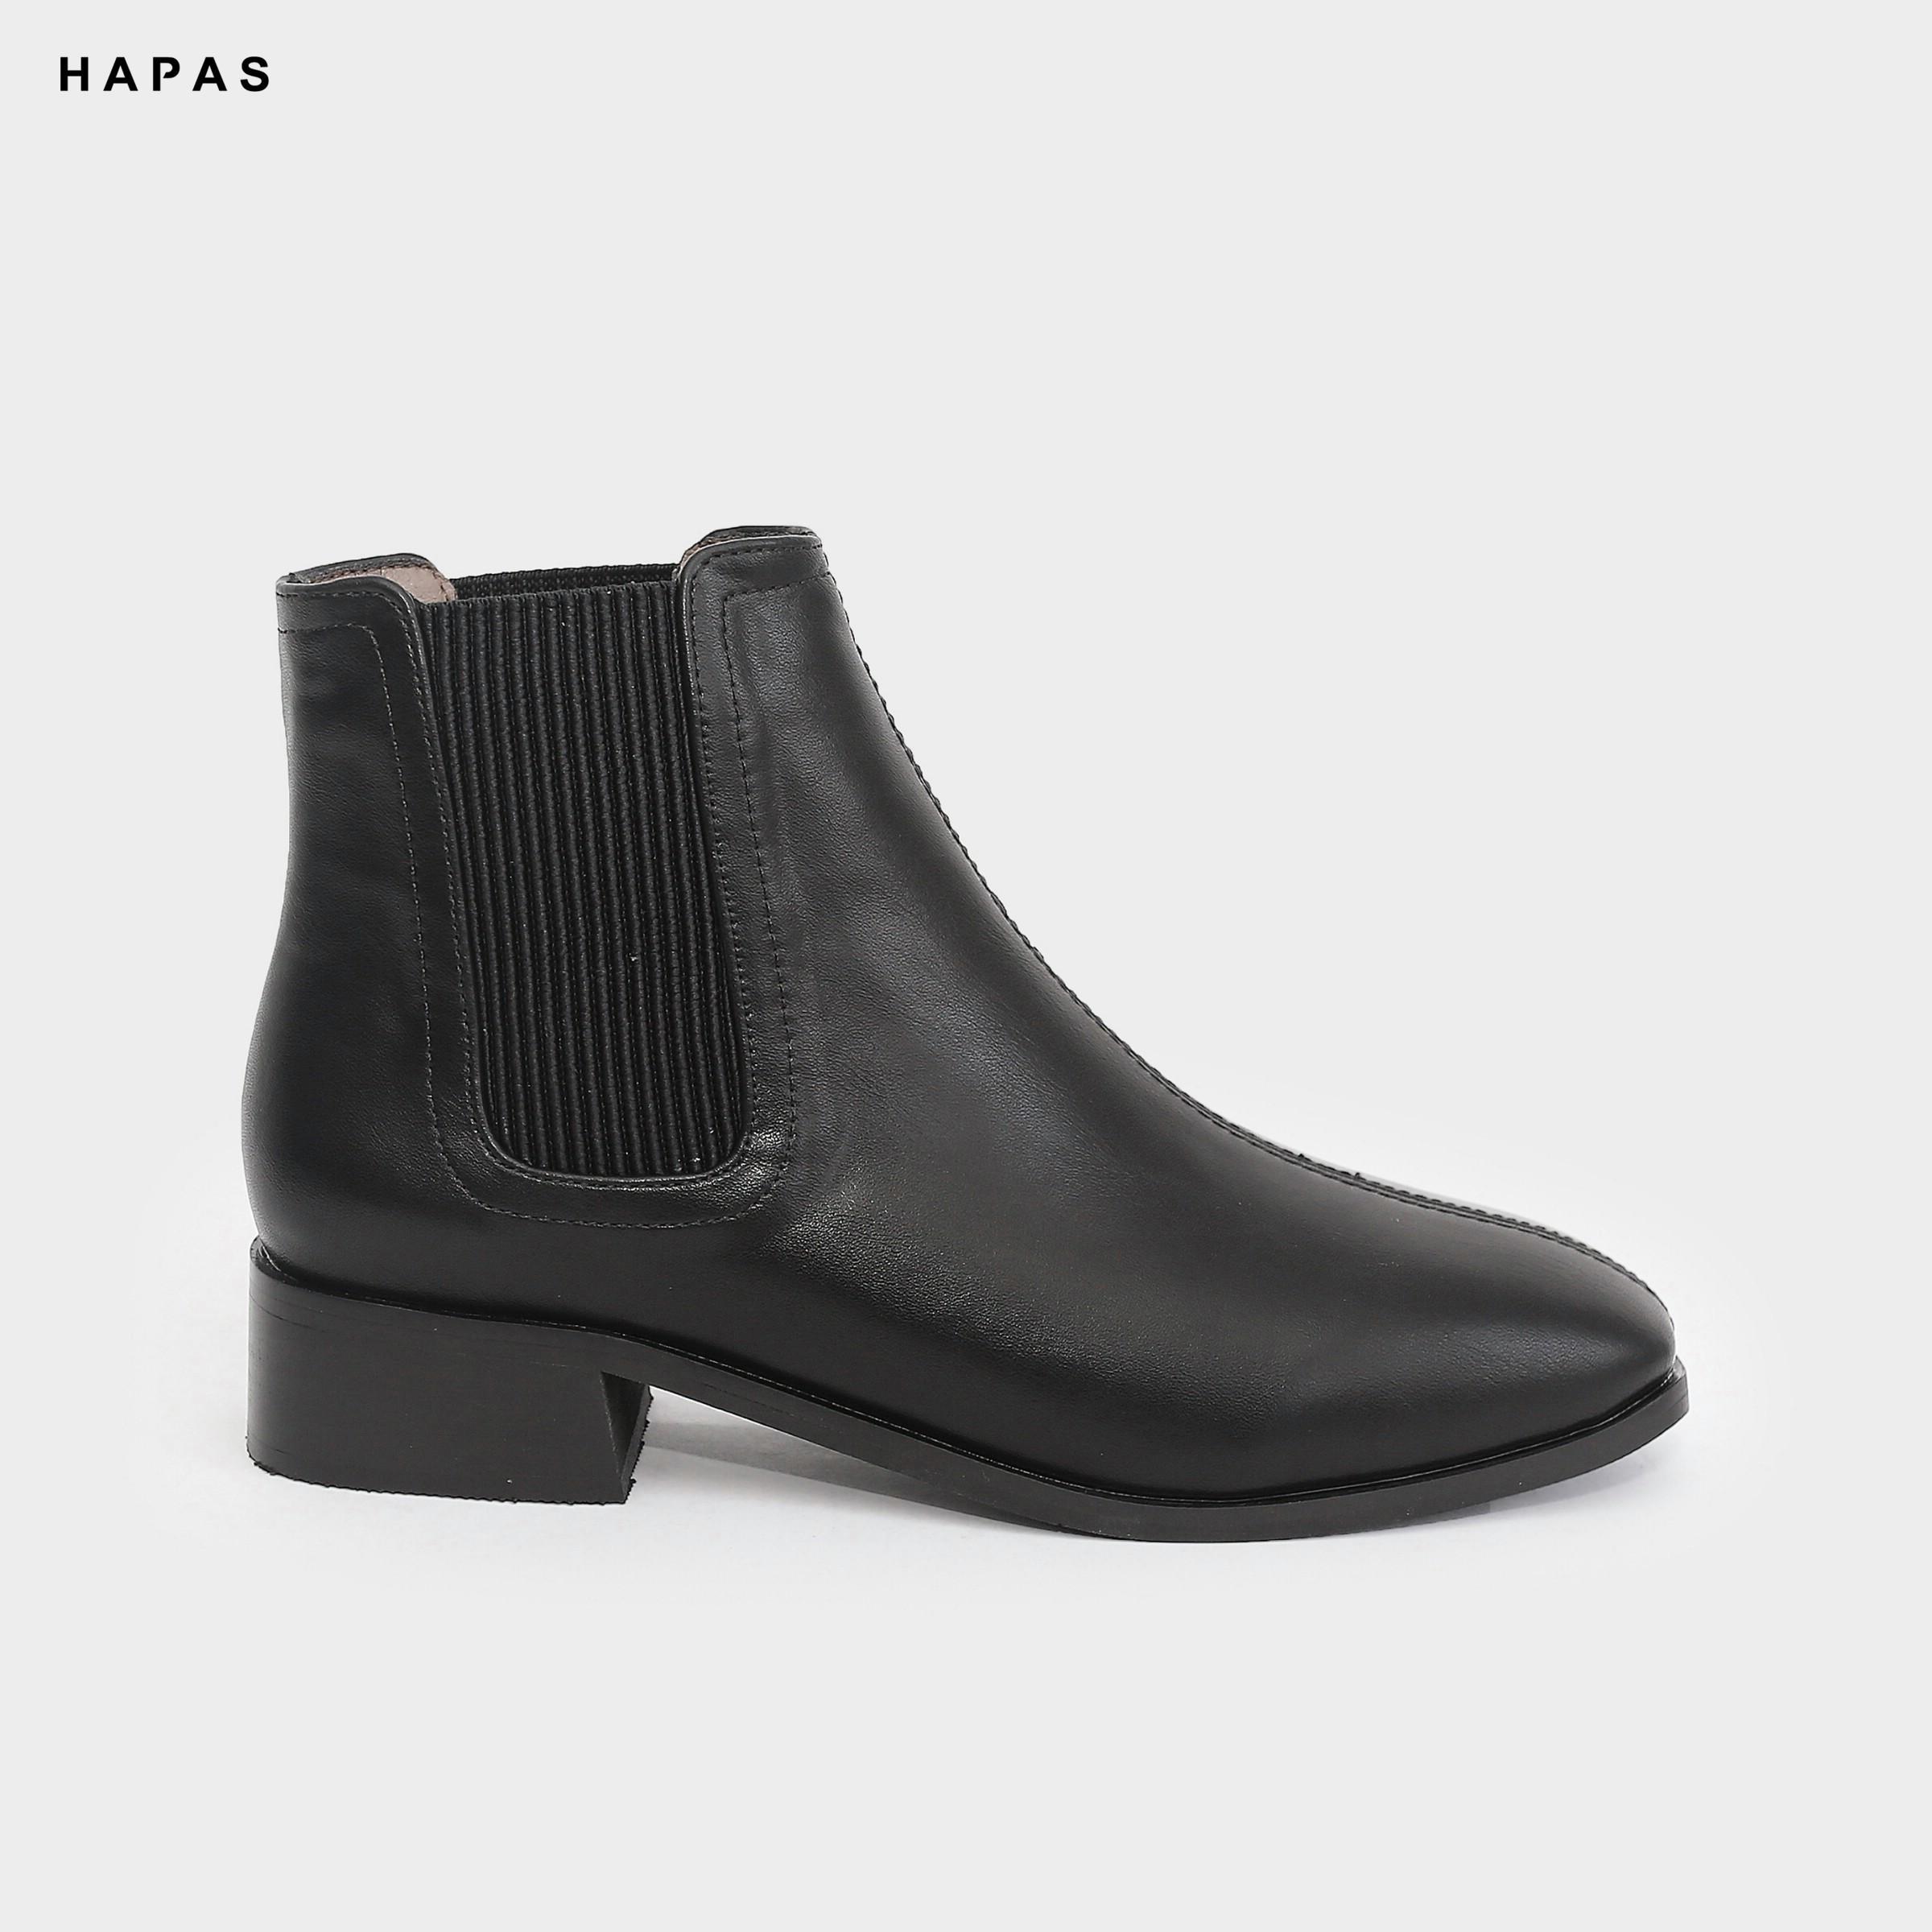 Boot Cổ Thấp Quai Chun HAPAS BOT32